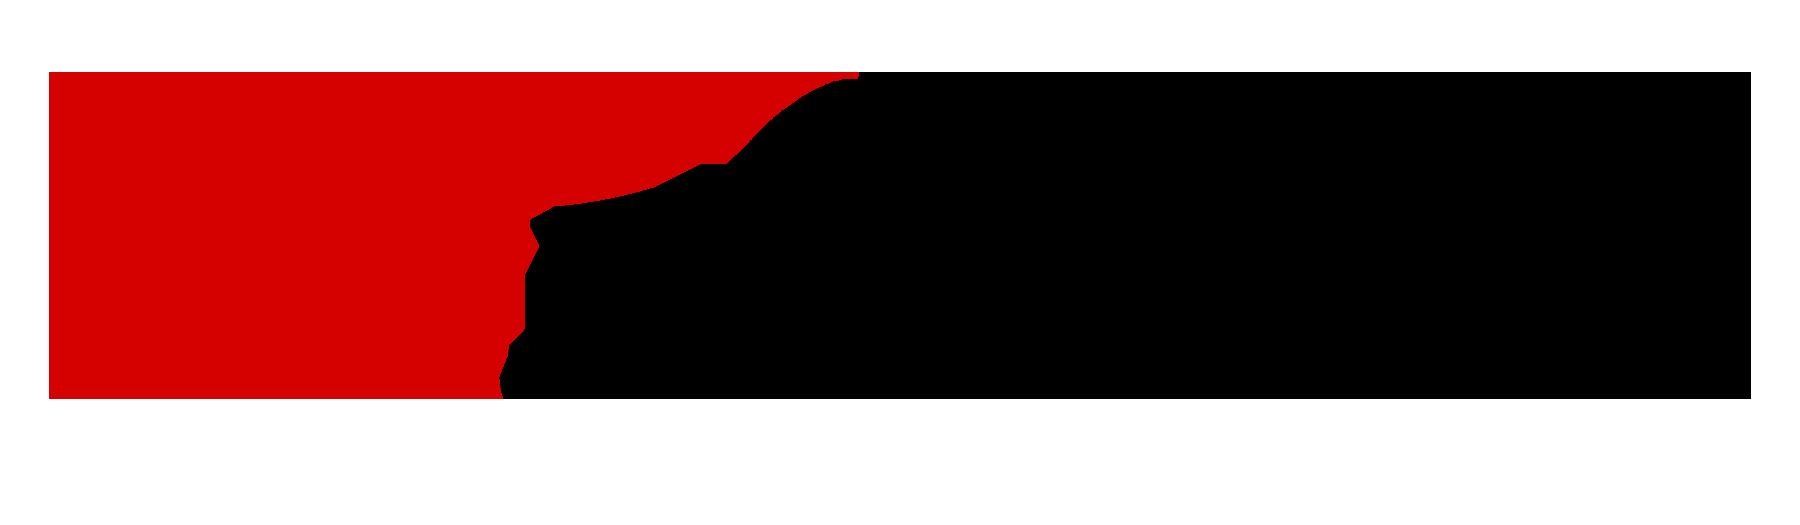 Torobilt Corporation, LLC